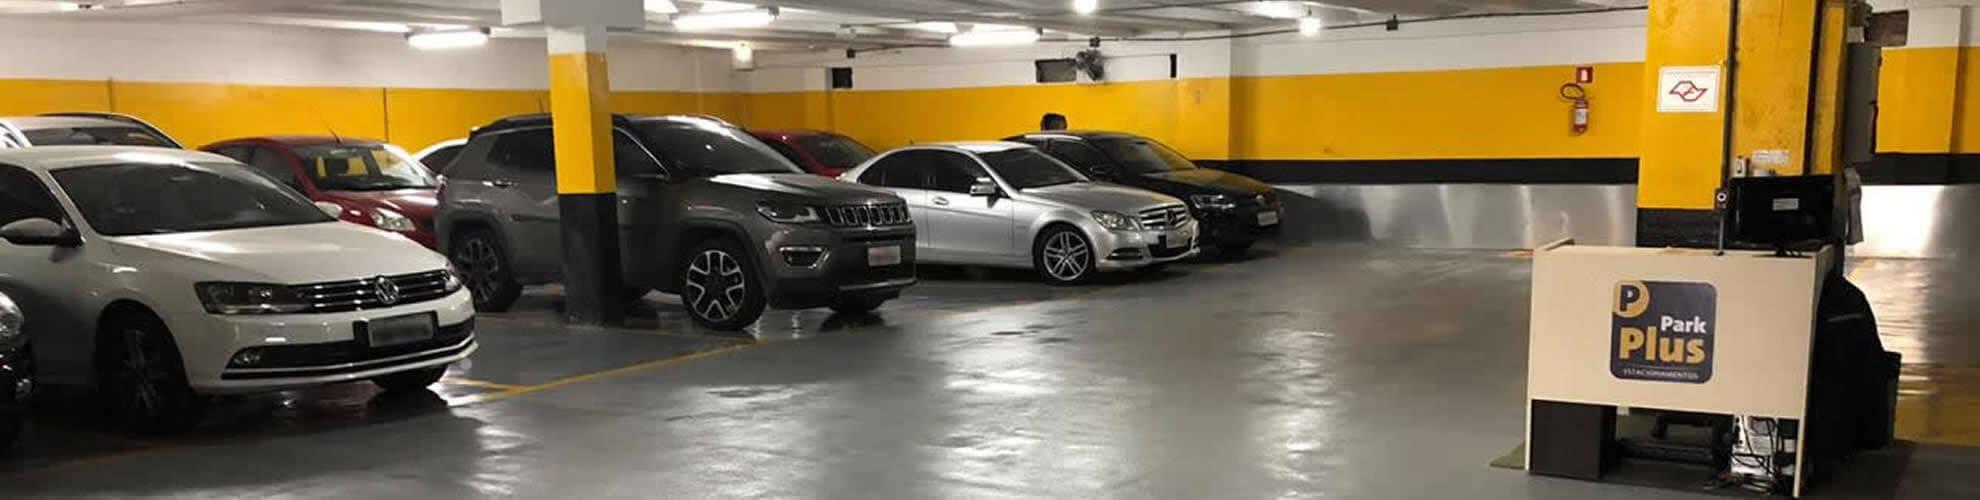 Vagas de Garagens